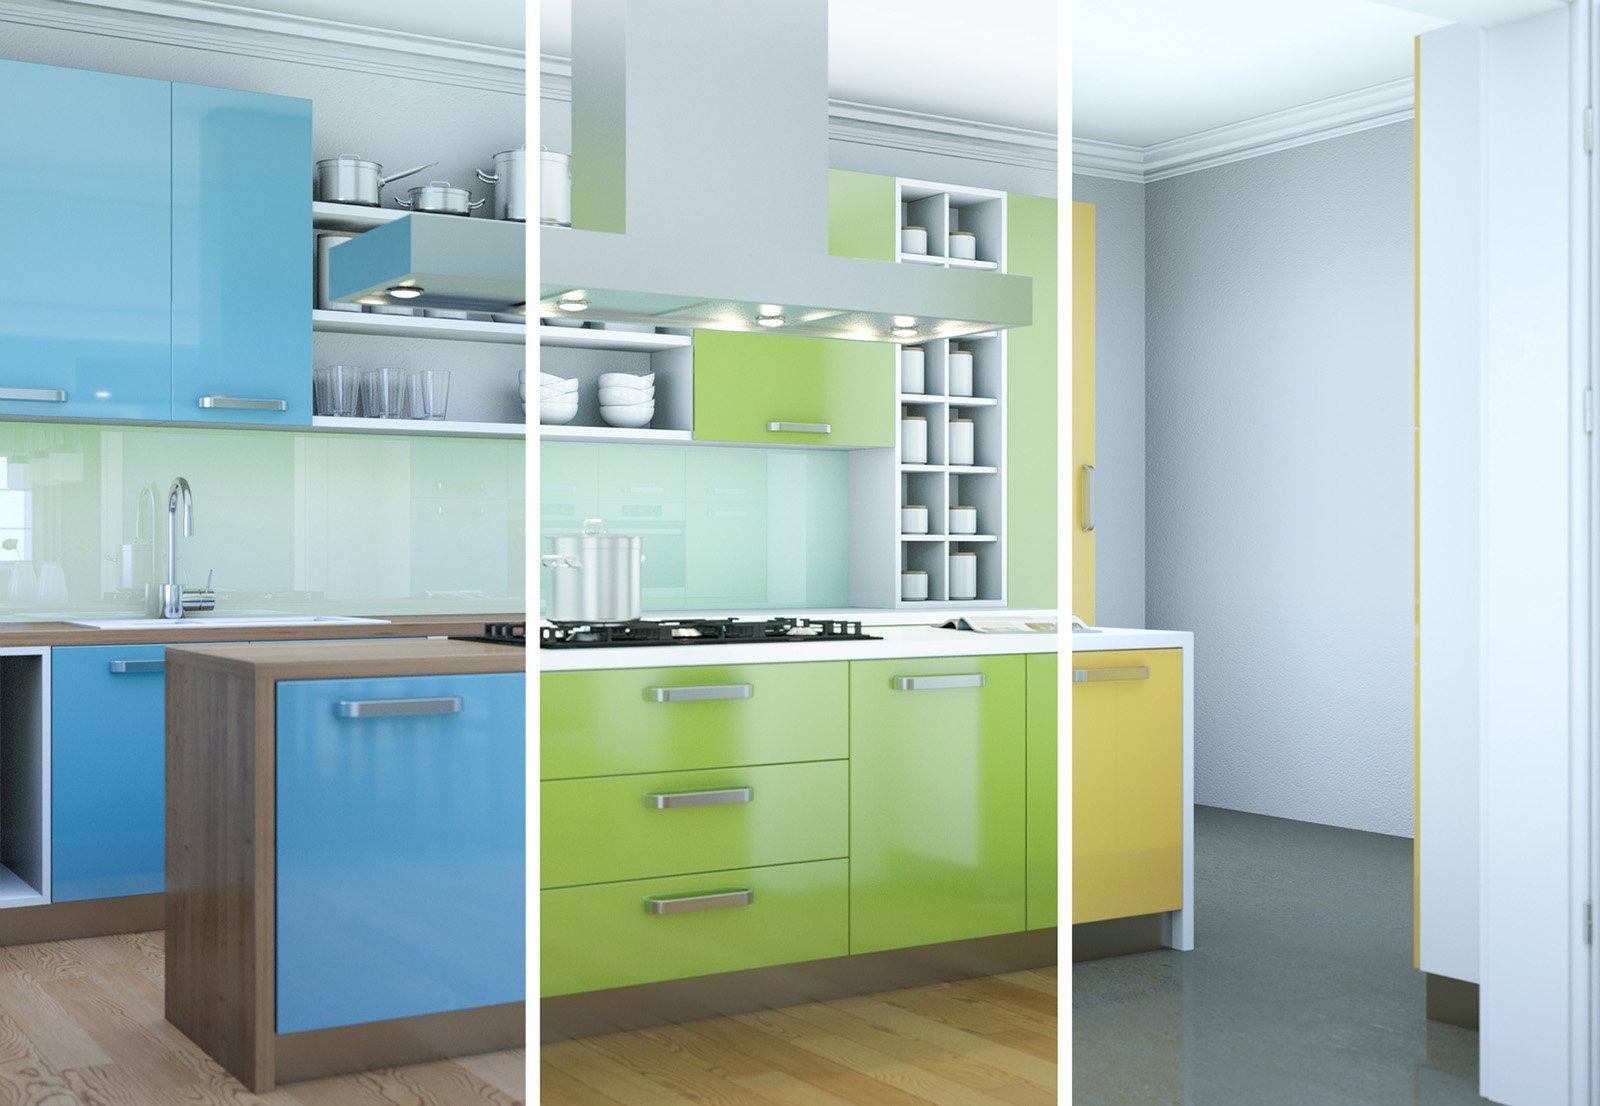 Dipingere mobili cucina xn68 regardsdefemmes - Verniciare ante cucina laminato ...